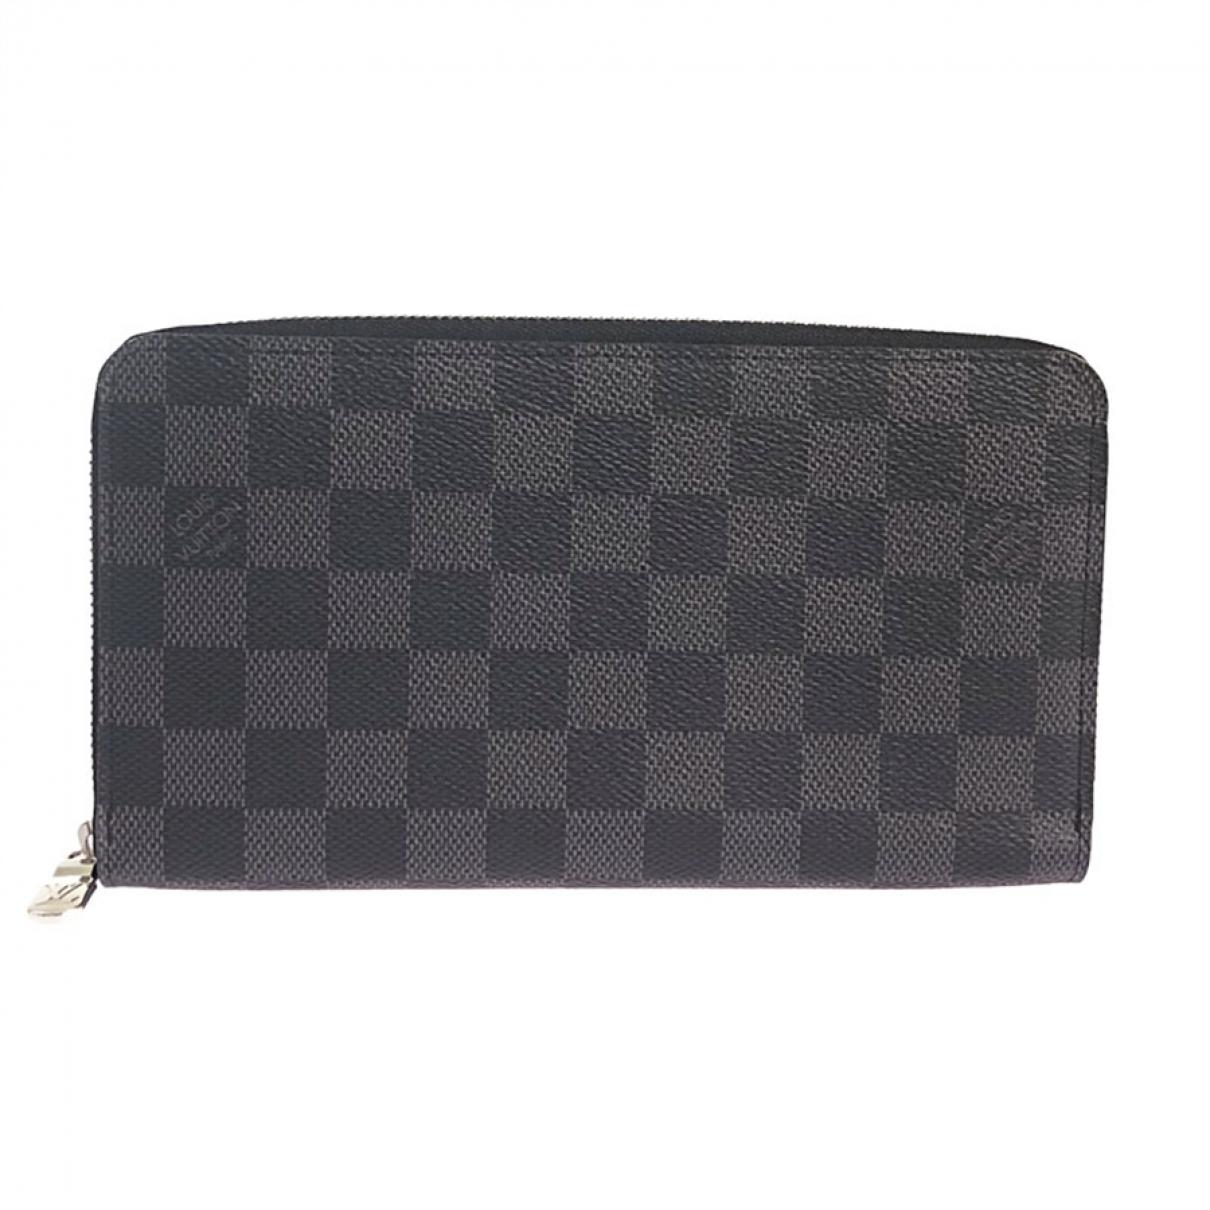 Louis Vuitton Zippy XL Grey Cloth Small bag, wallet & cases for Men \N